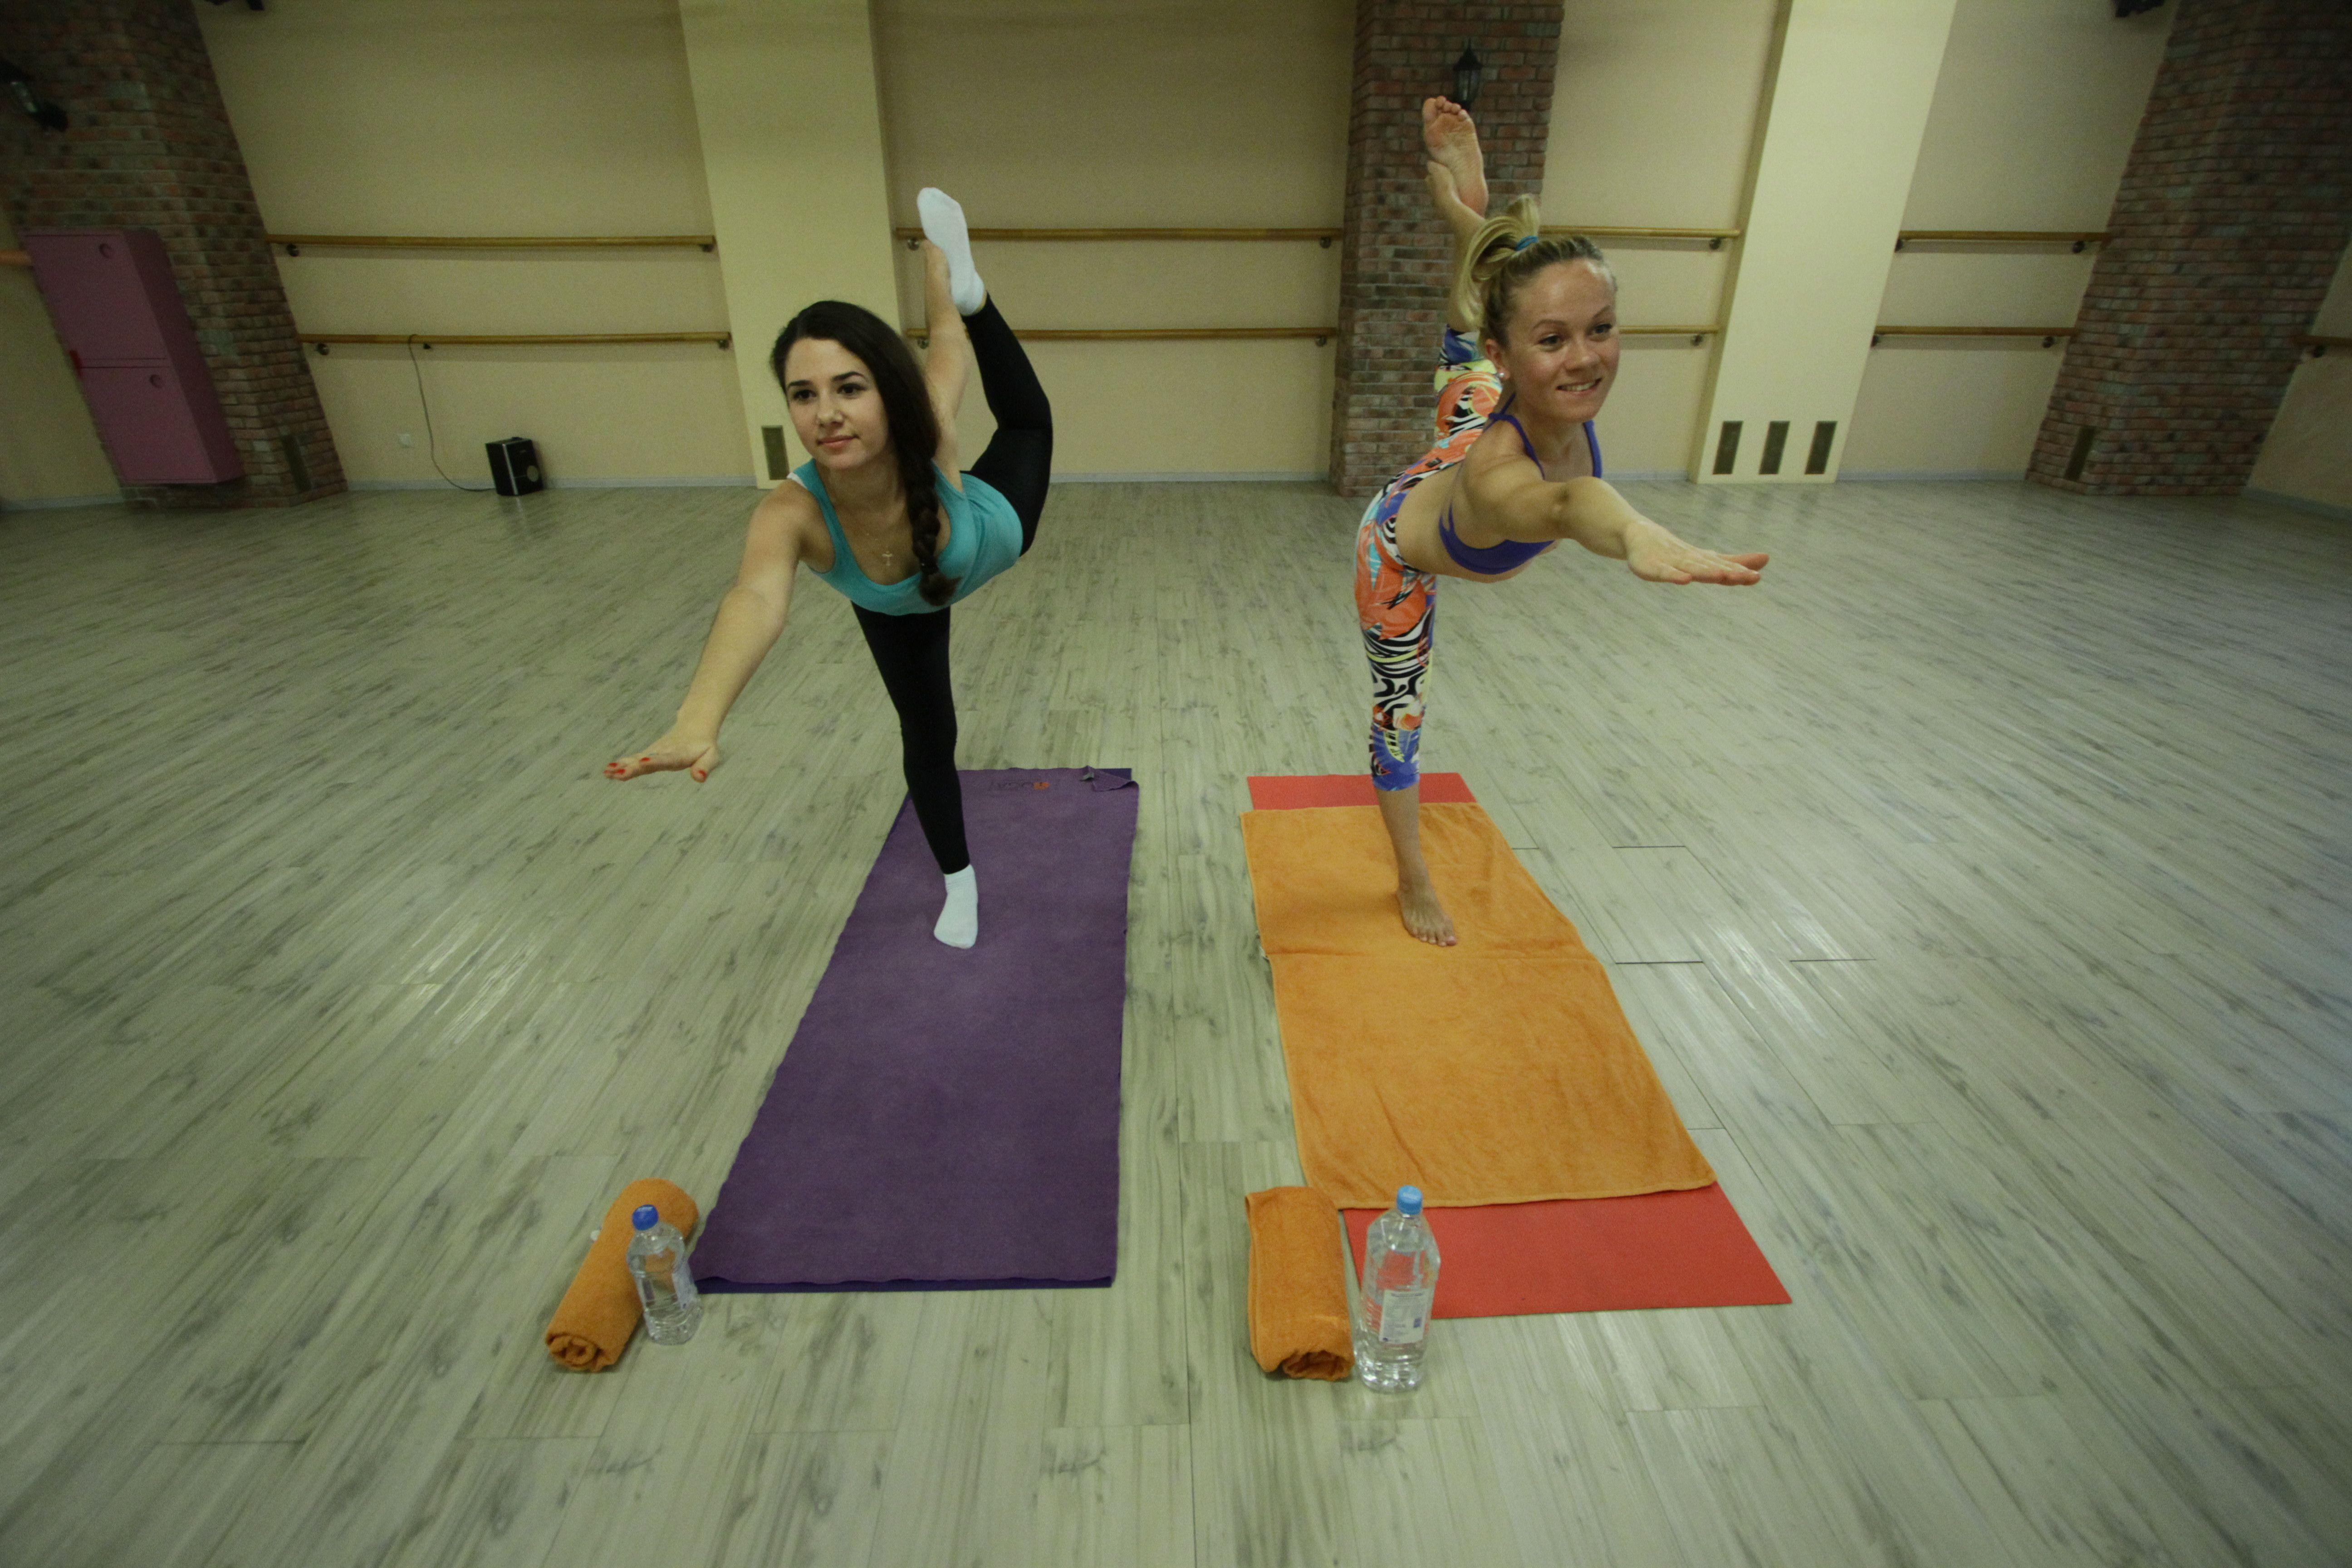 Москвичей пригласили на онлайн-занятия йогой